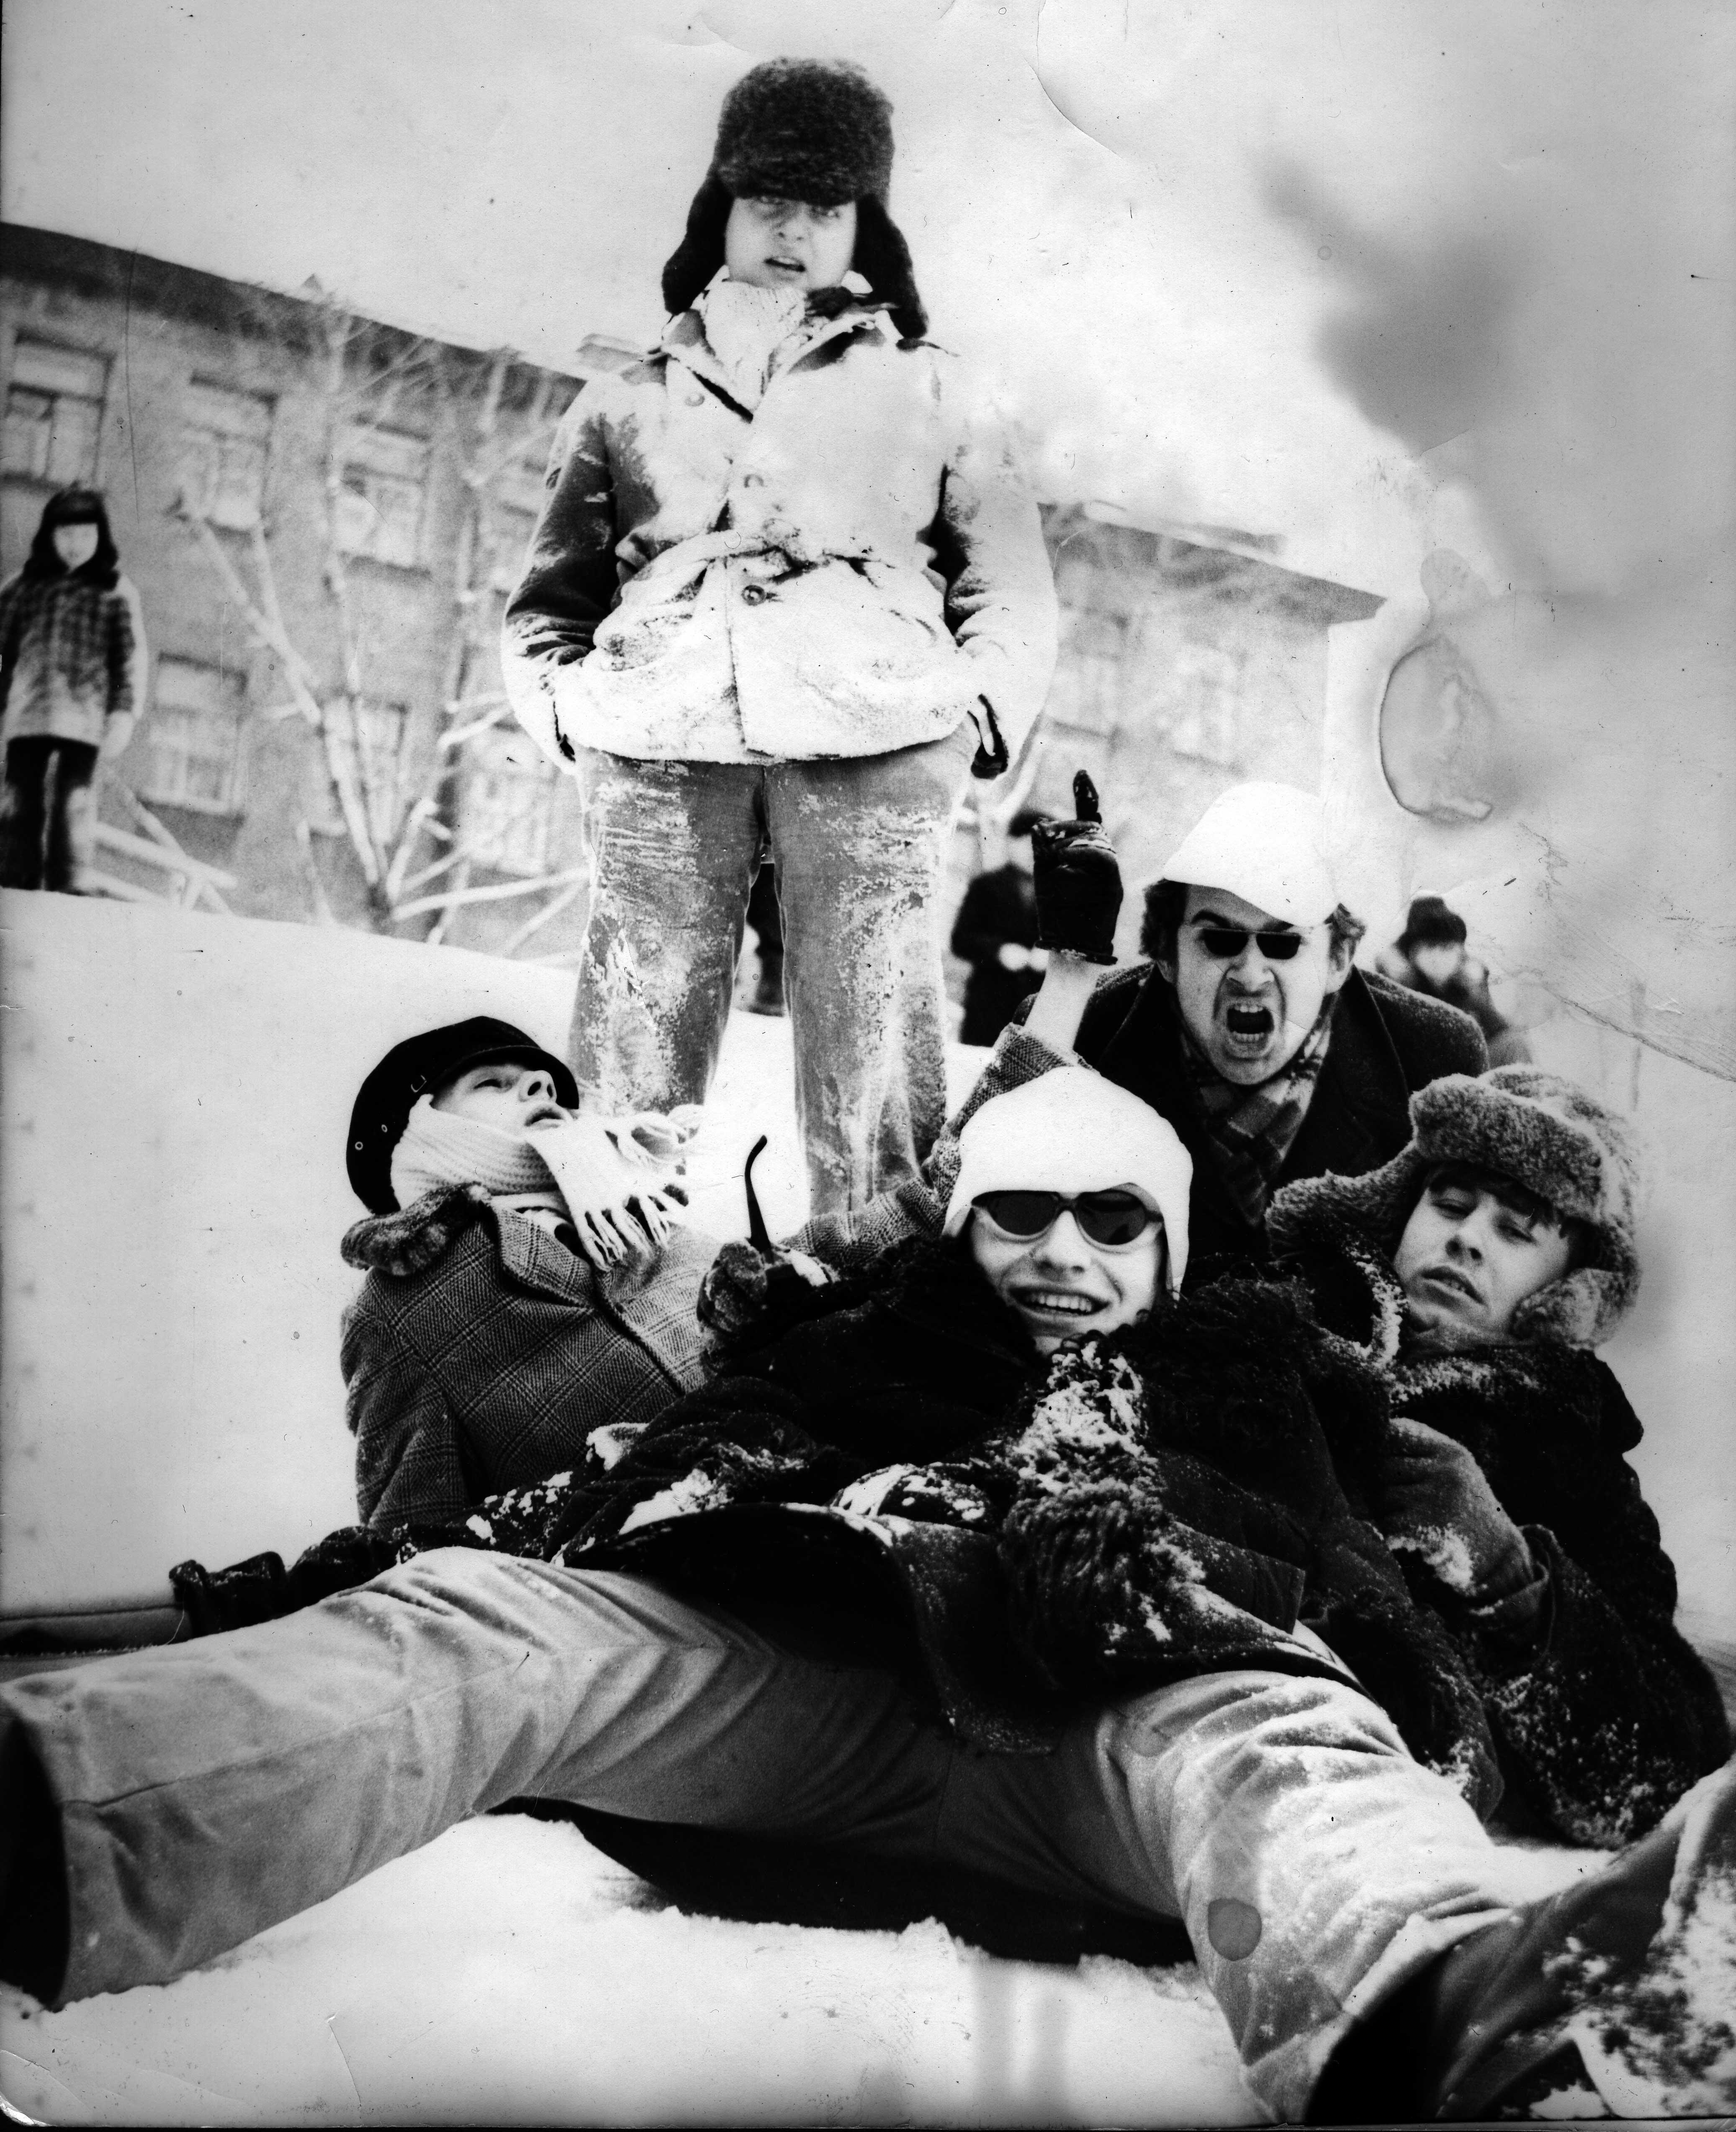 Свин и тусовка (Юфит, Цой и др.), конец 70-х, начало 80-х